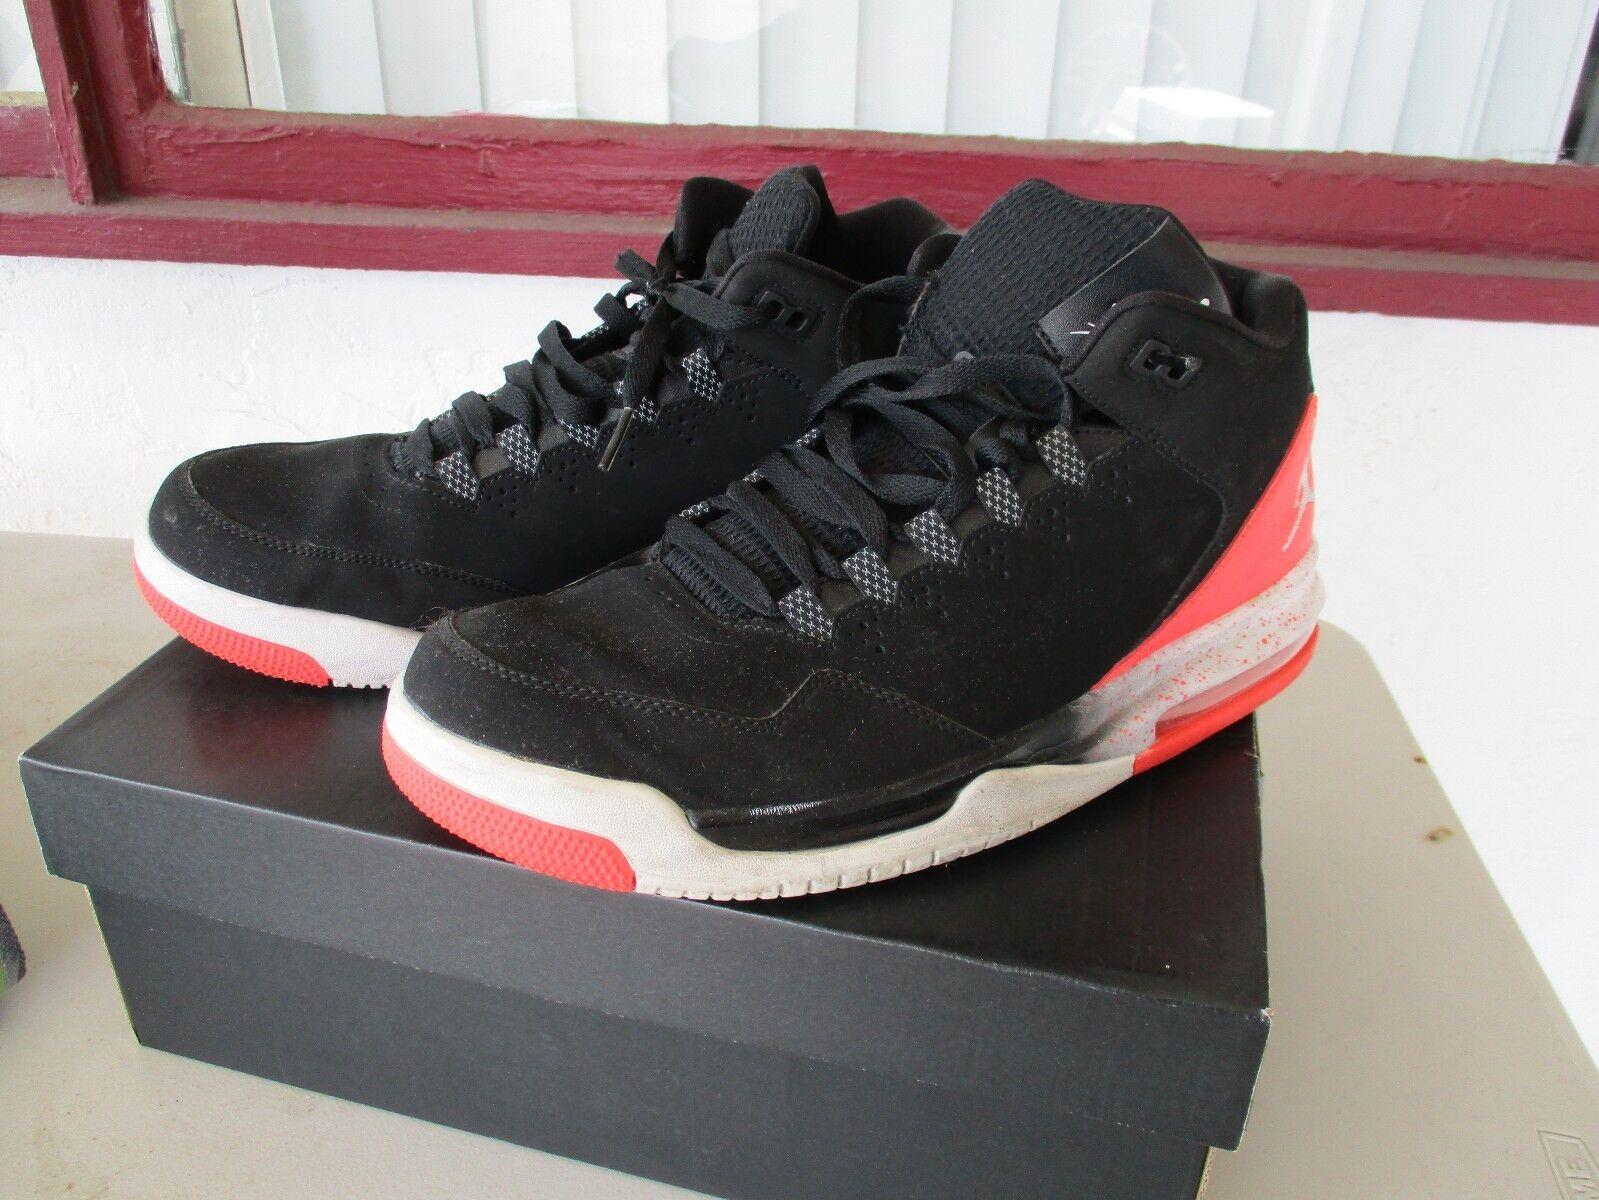 Men's Jordan Flight Origin 2 Off Court Shoes, 705155 016 Size 10 Black/Orange